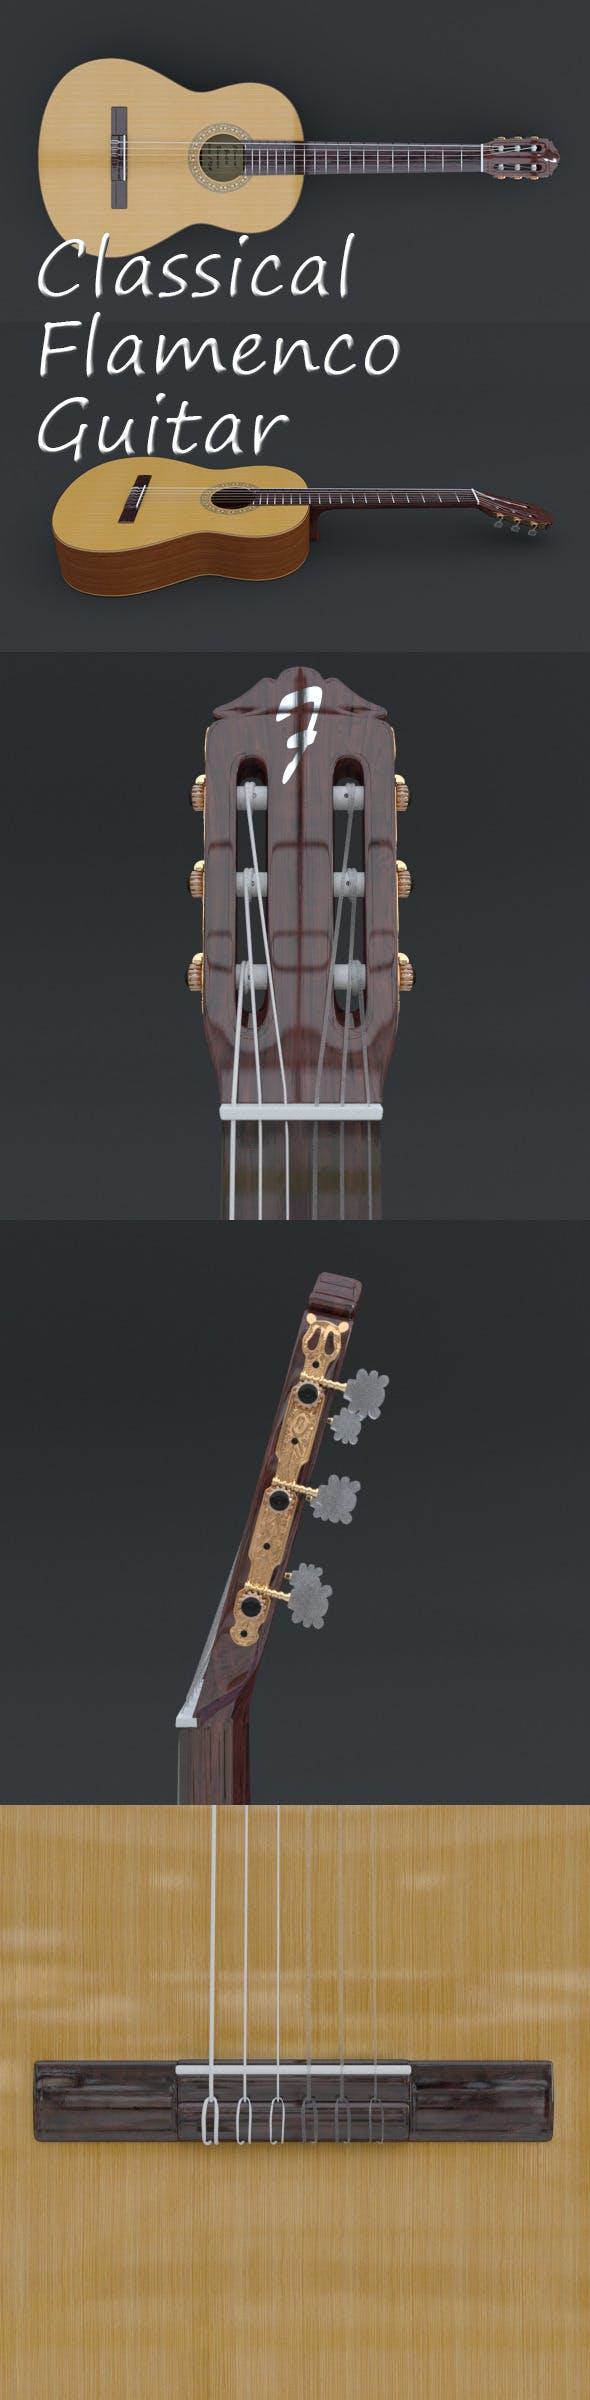 Classical Flamenco Guitar - 3DOcean Item for Sale